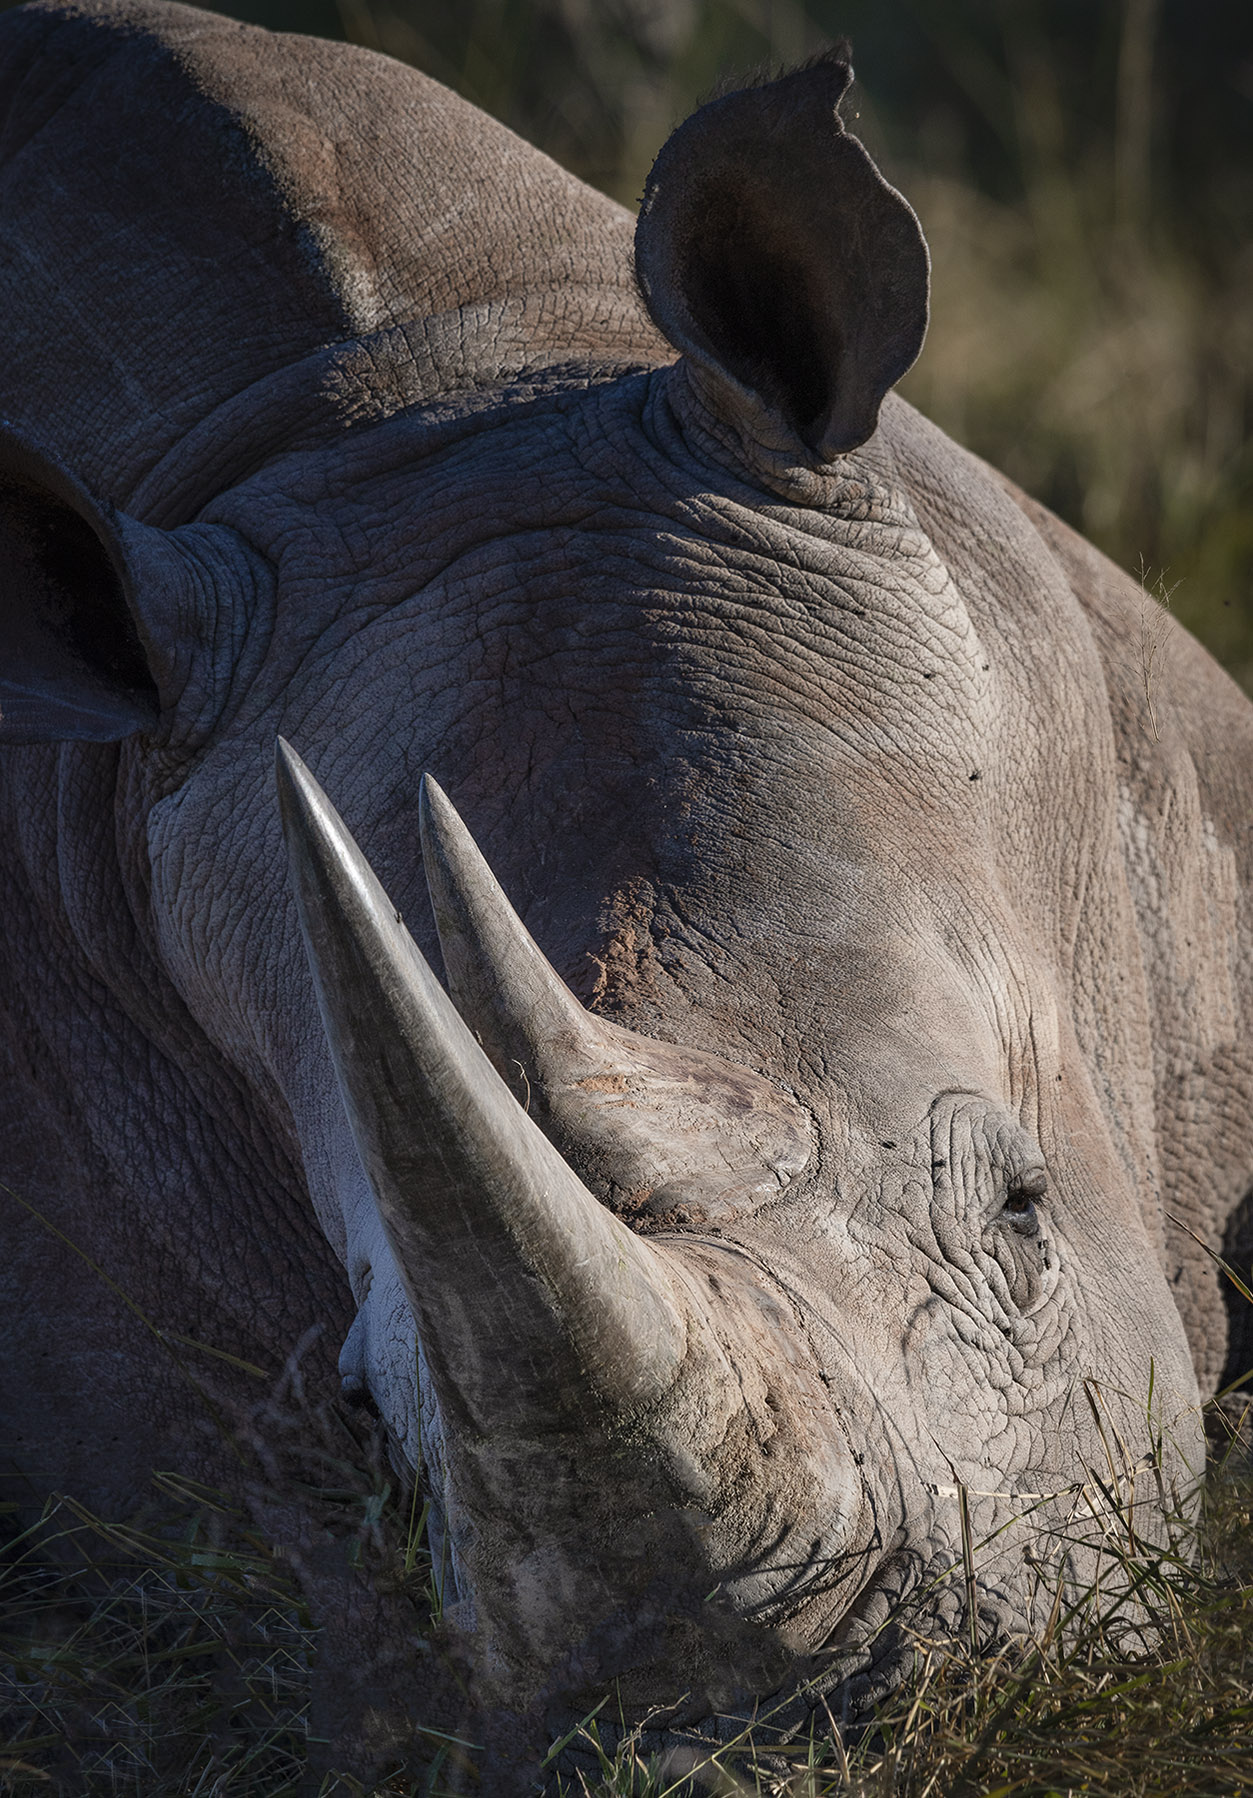 Rhino close up